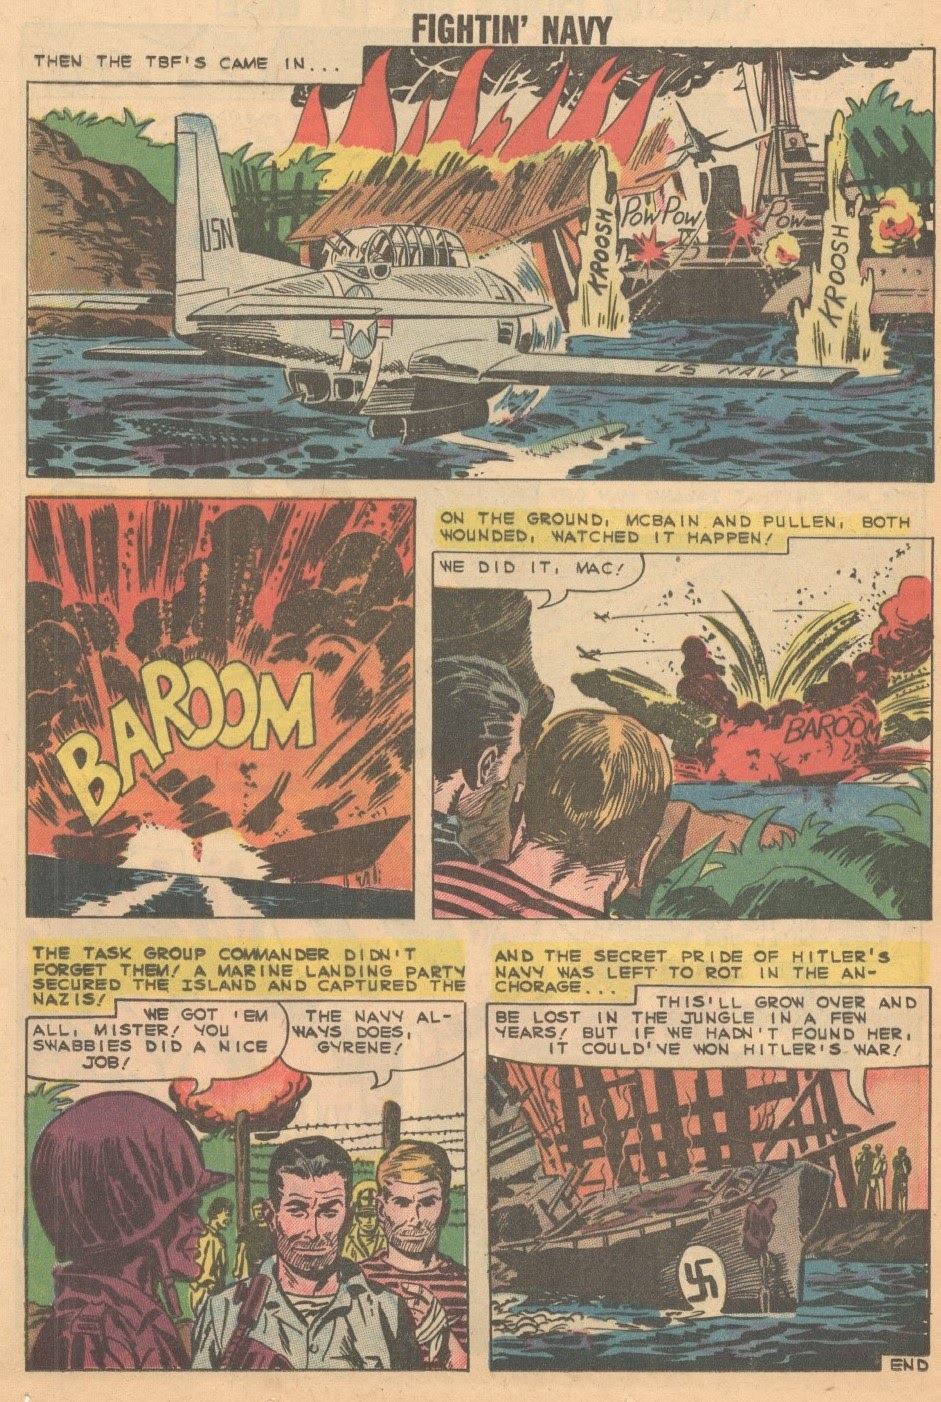 Read online Fightin' Navy comic -  Issue #93 - 24